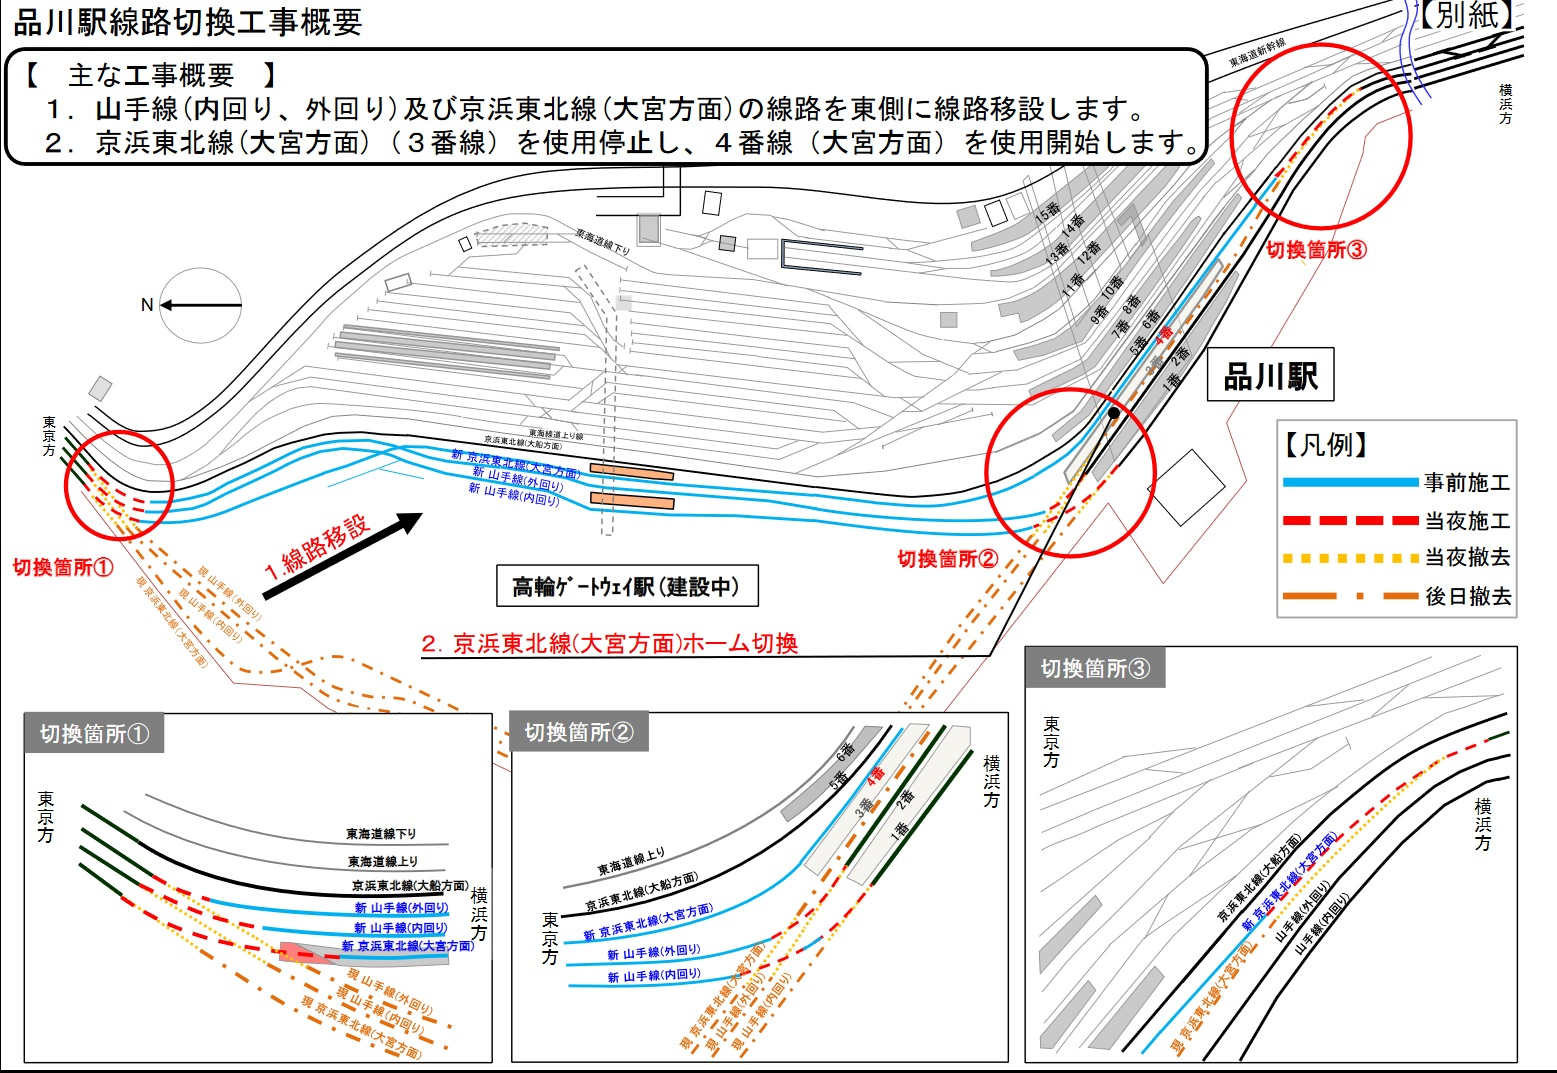 JR発表品川駅線路切替概要